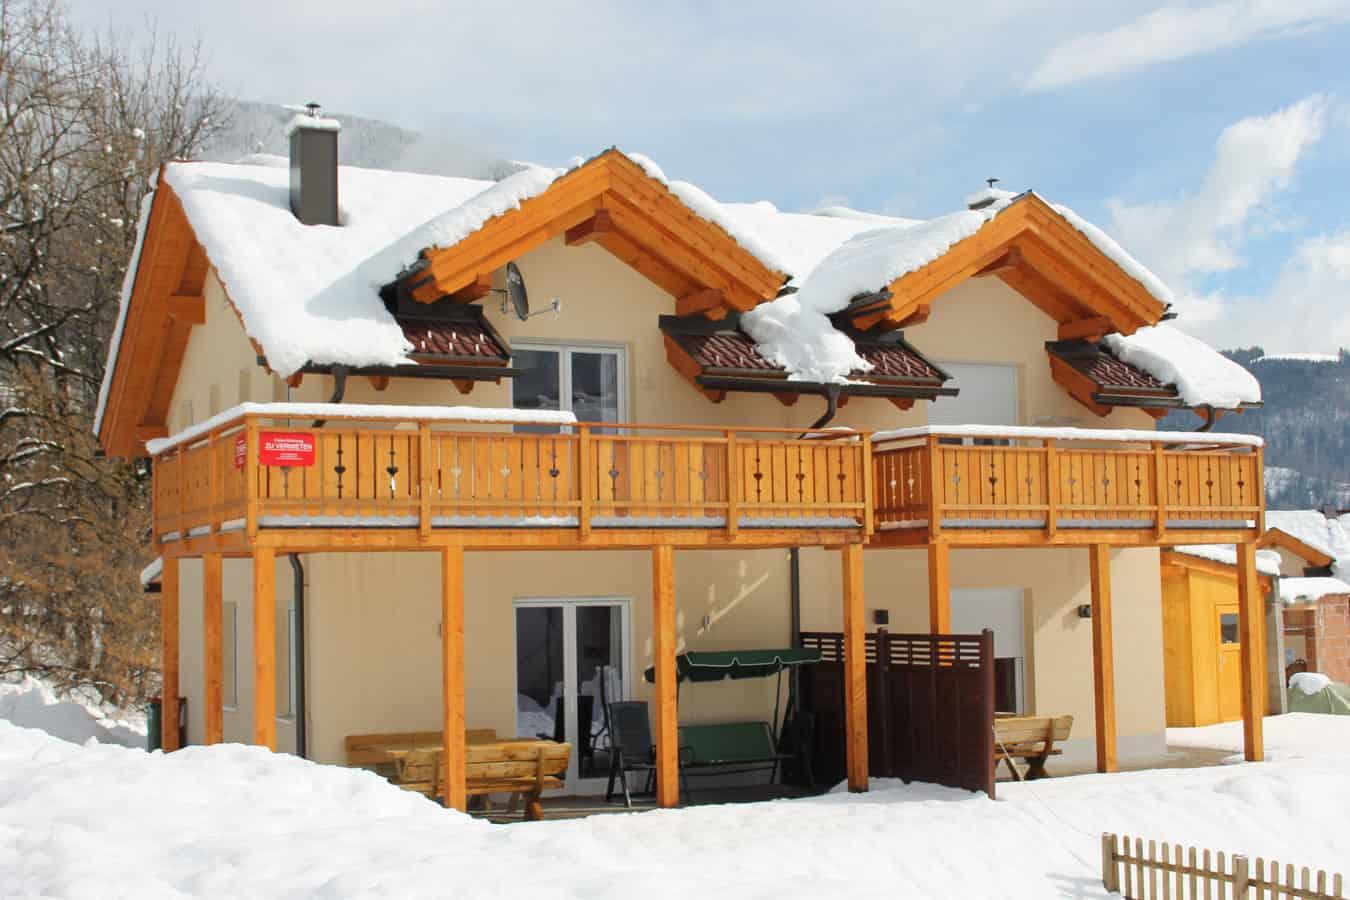 villa-paul-impressie-2-villa-exterieur-1-kwo-villa